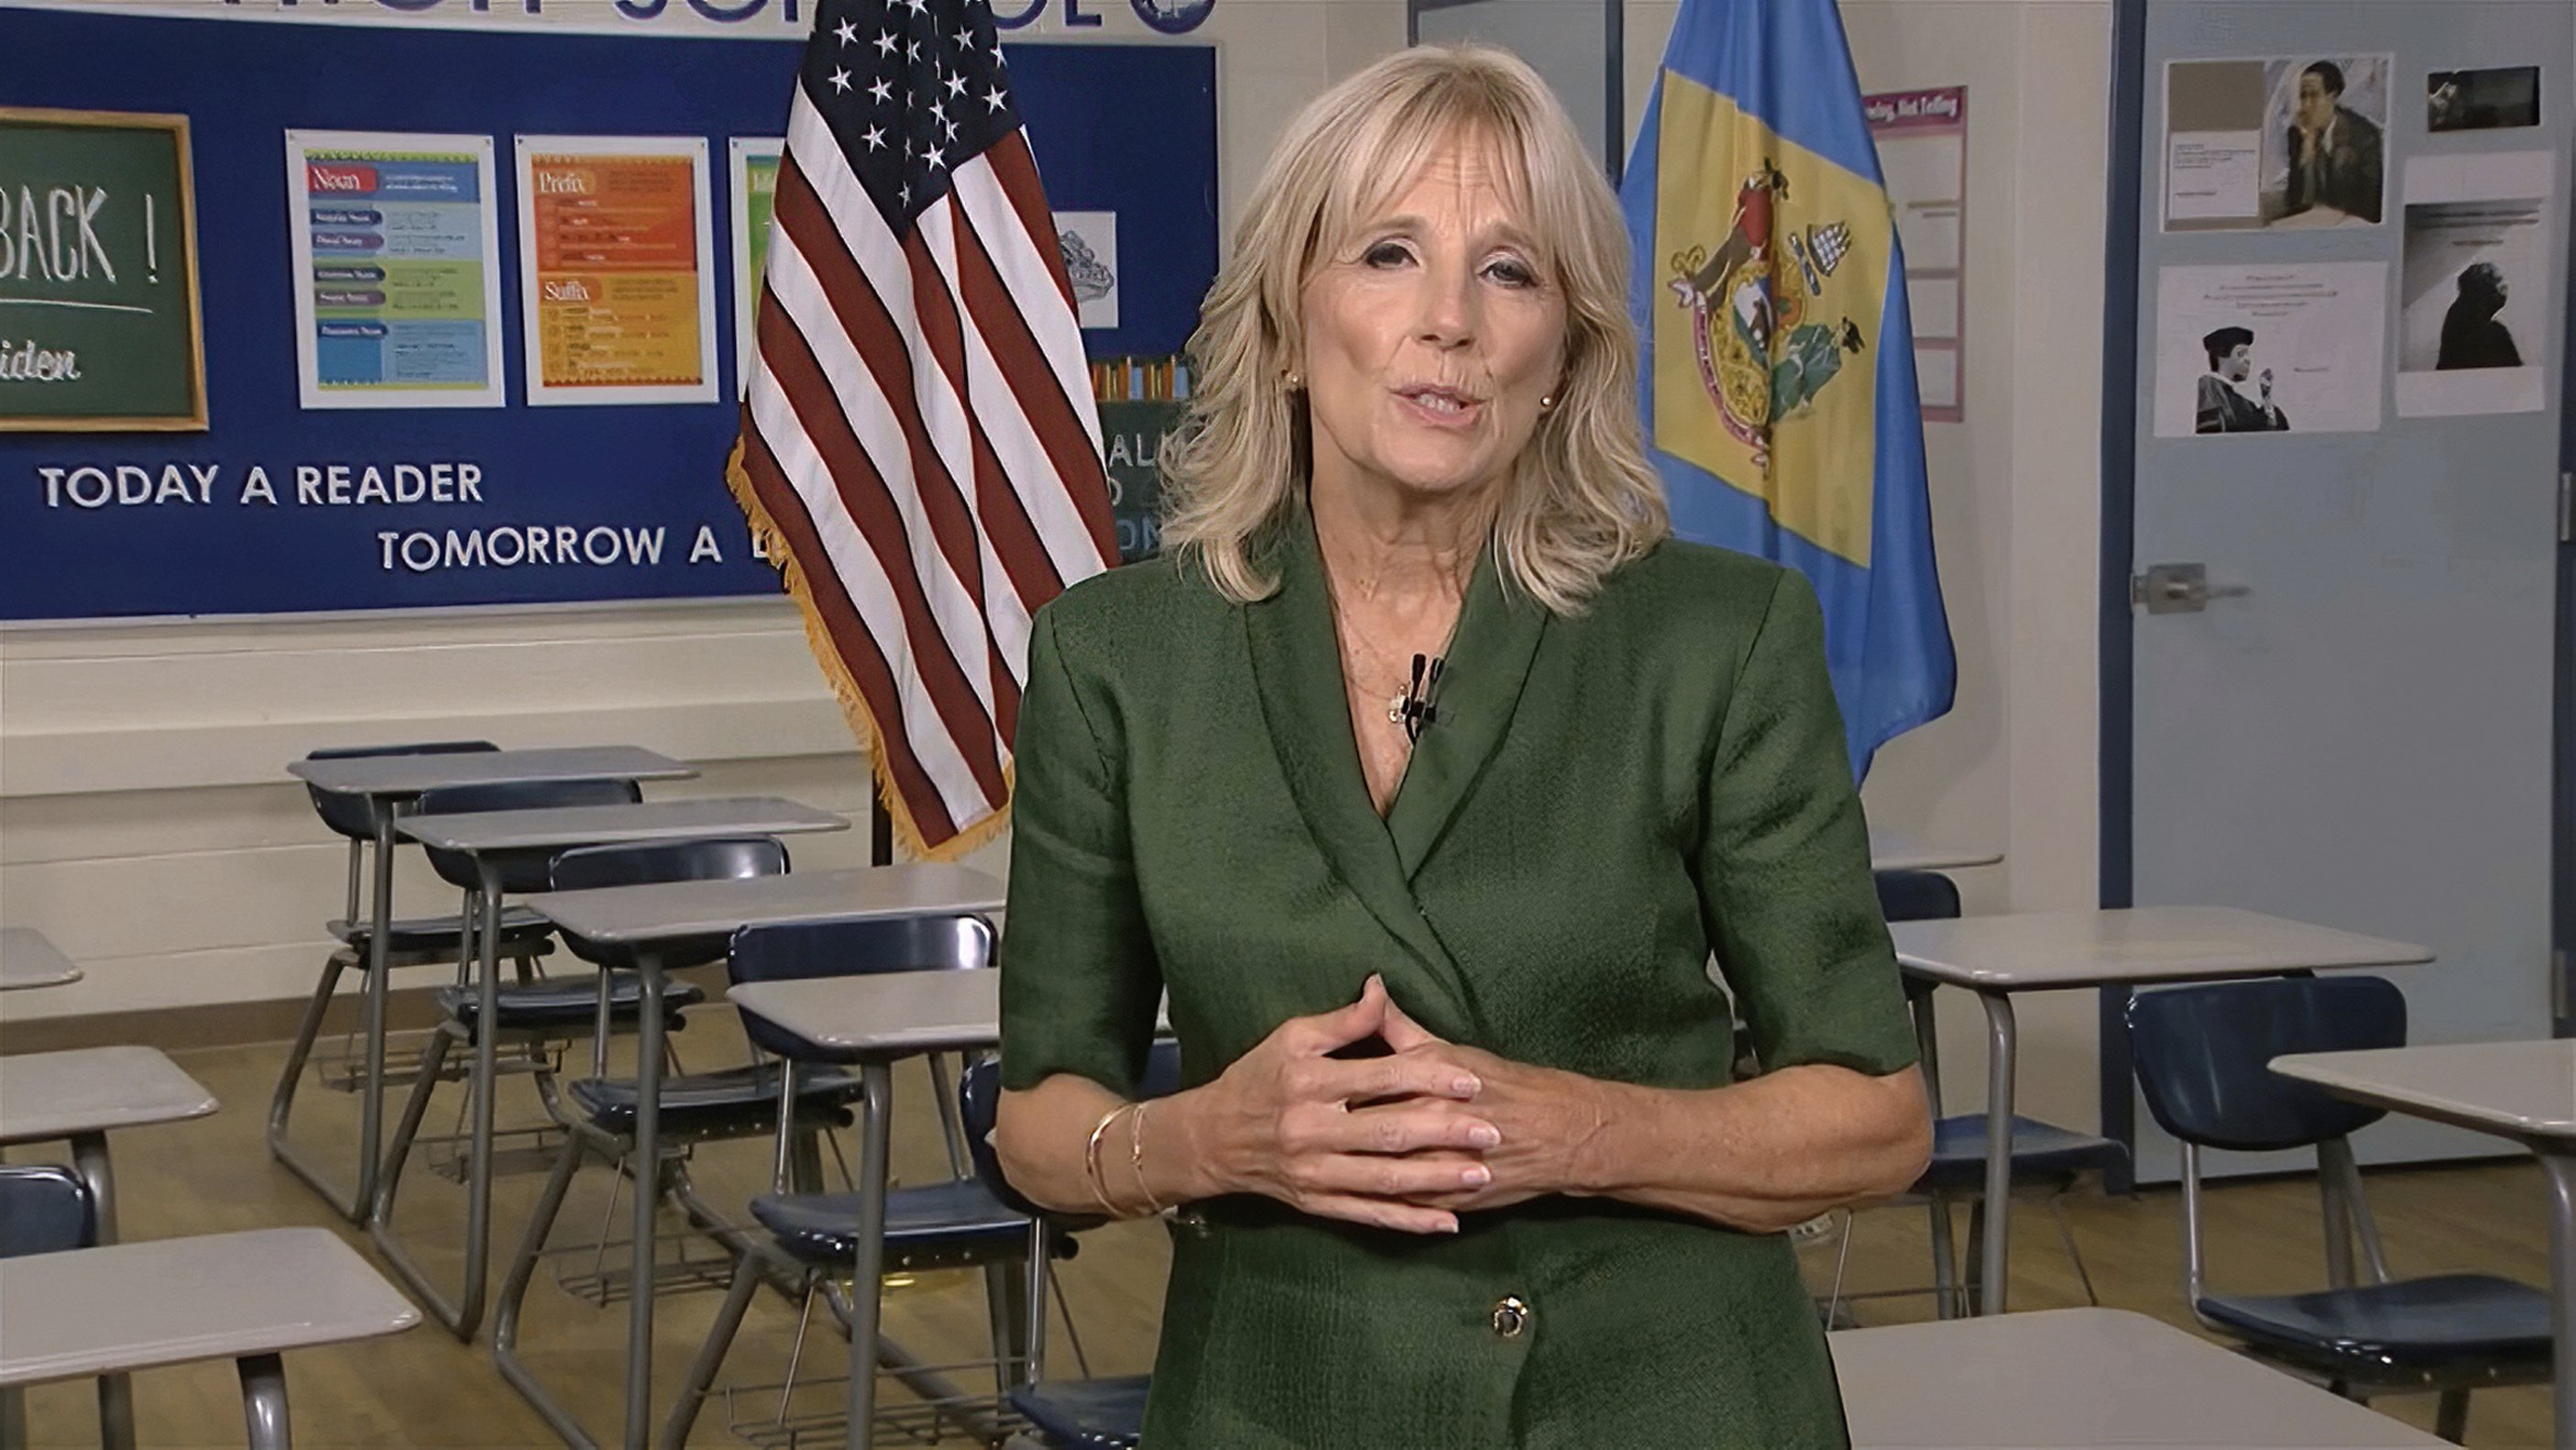 At DNC, Jill Biden pledges husband Joe will 'make us whole'